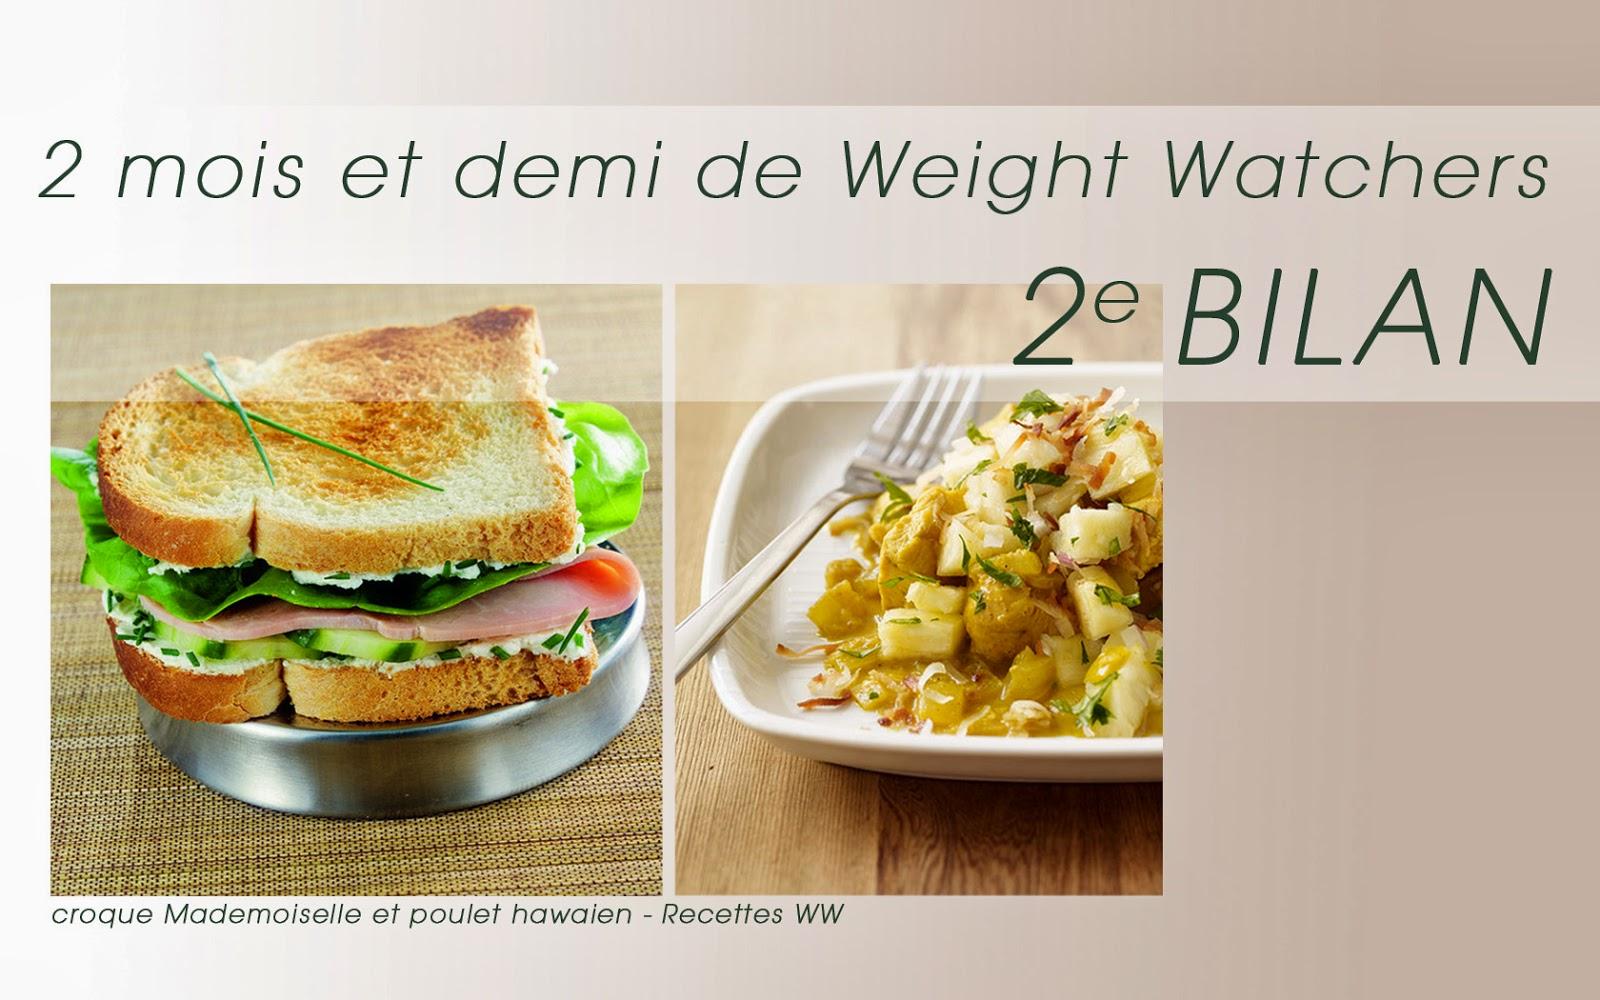 2.5 mois de régime Weight Watchers - Deuxieme Bilan